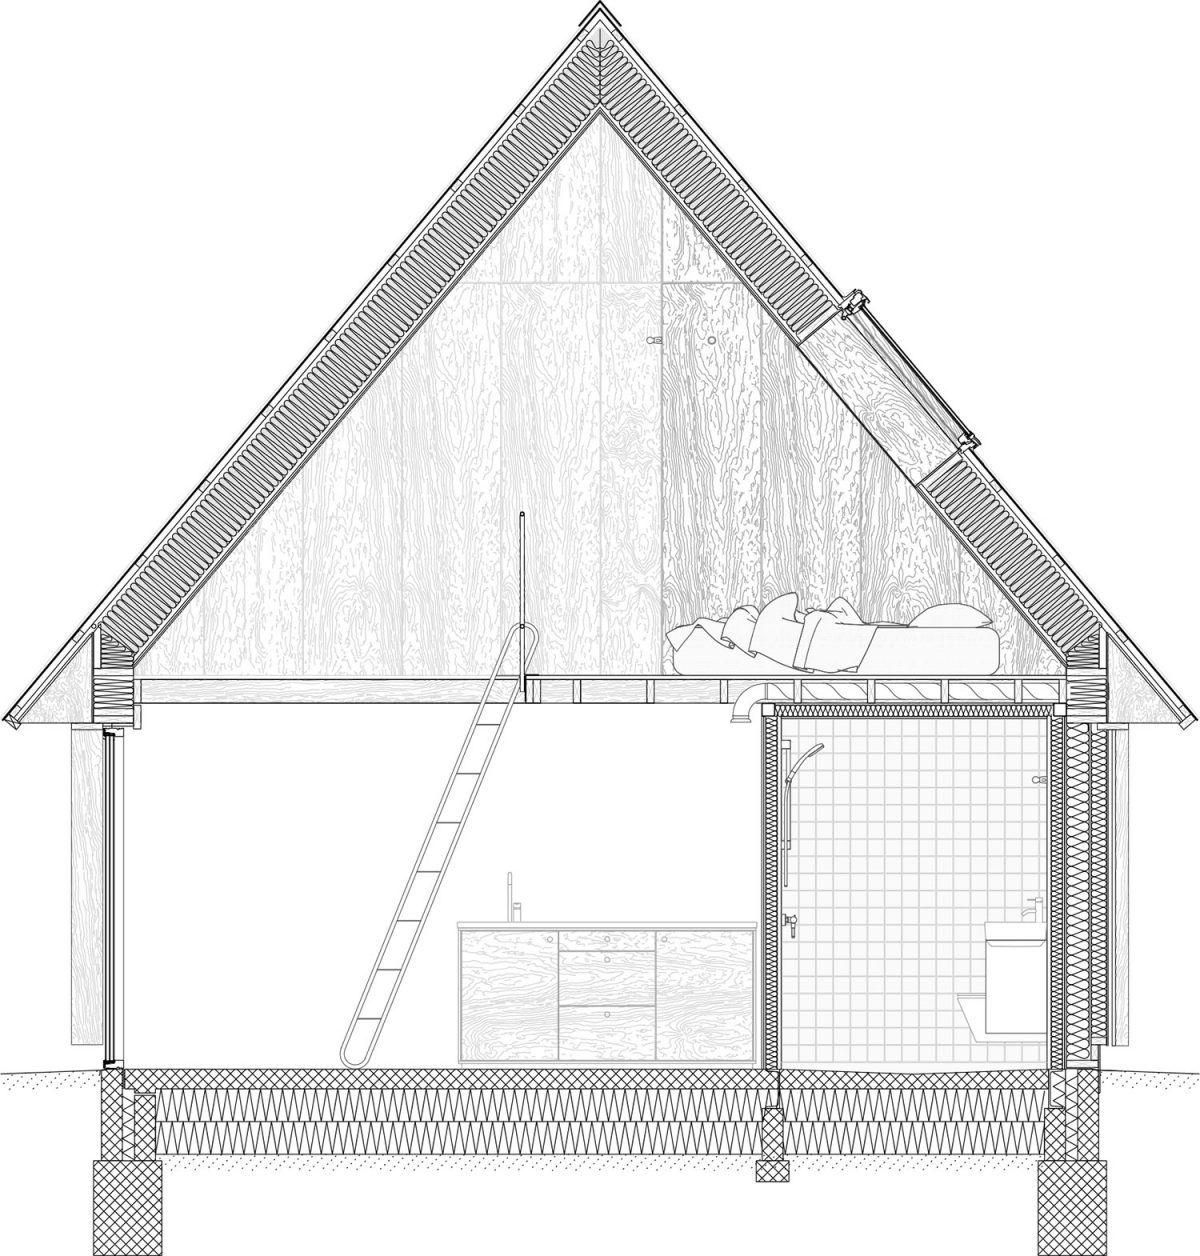 Studielandsbyen Groft Og Fint Anmeldelse Lenschow Pihlmann Roof Detail Architecture Architectural Section Roof Architecture